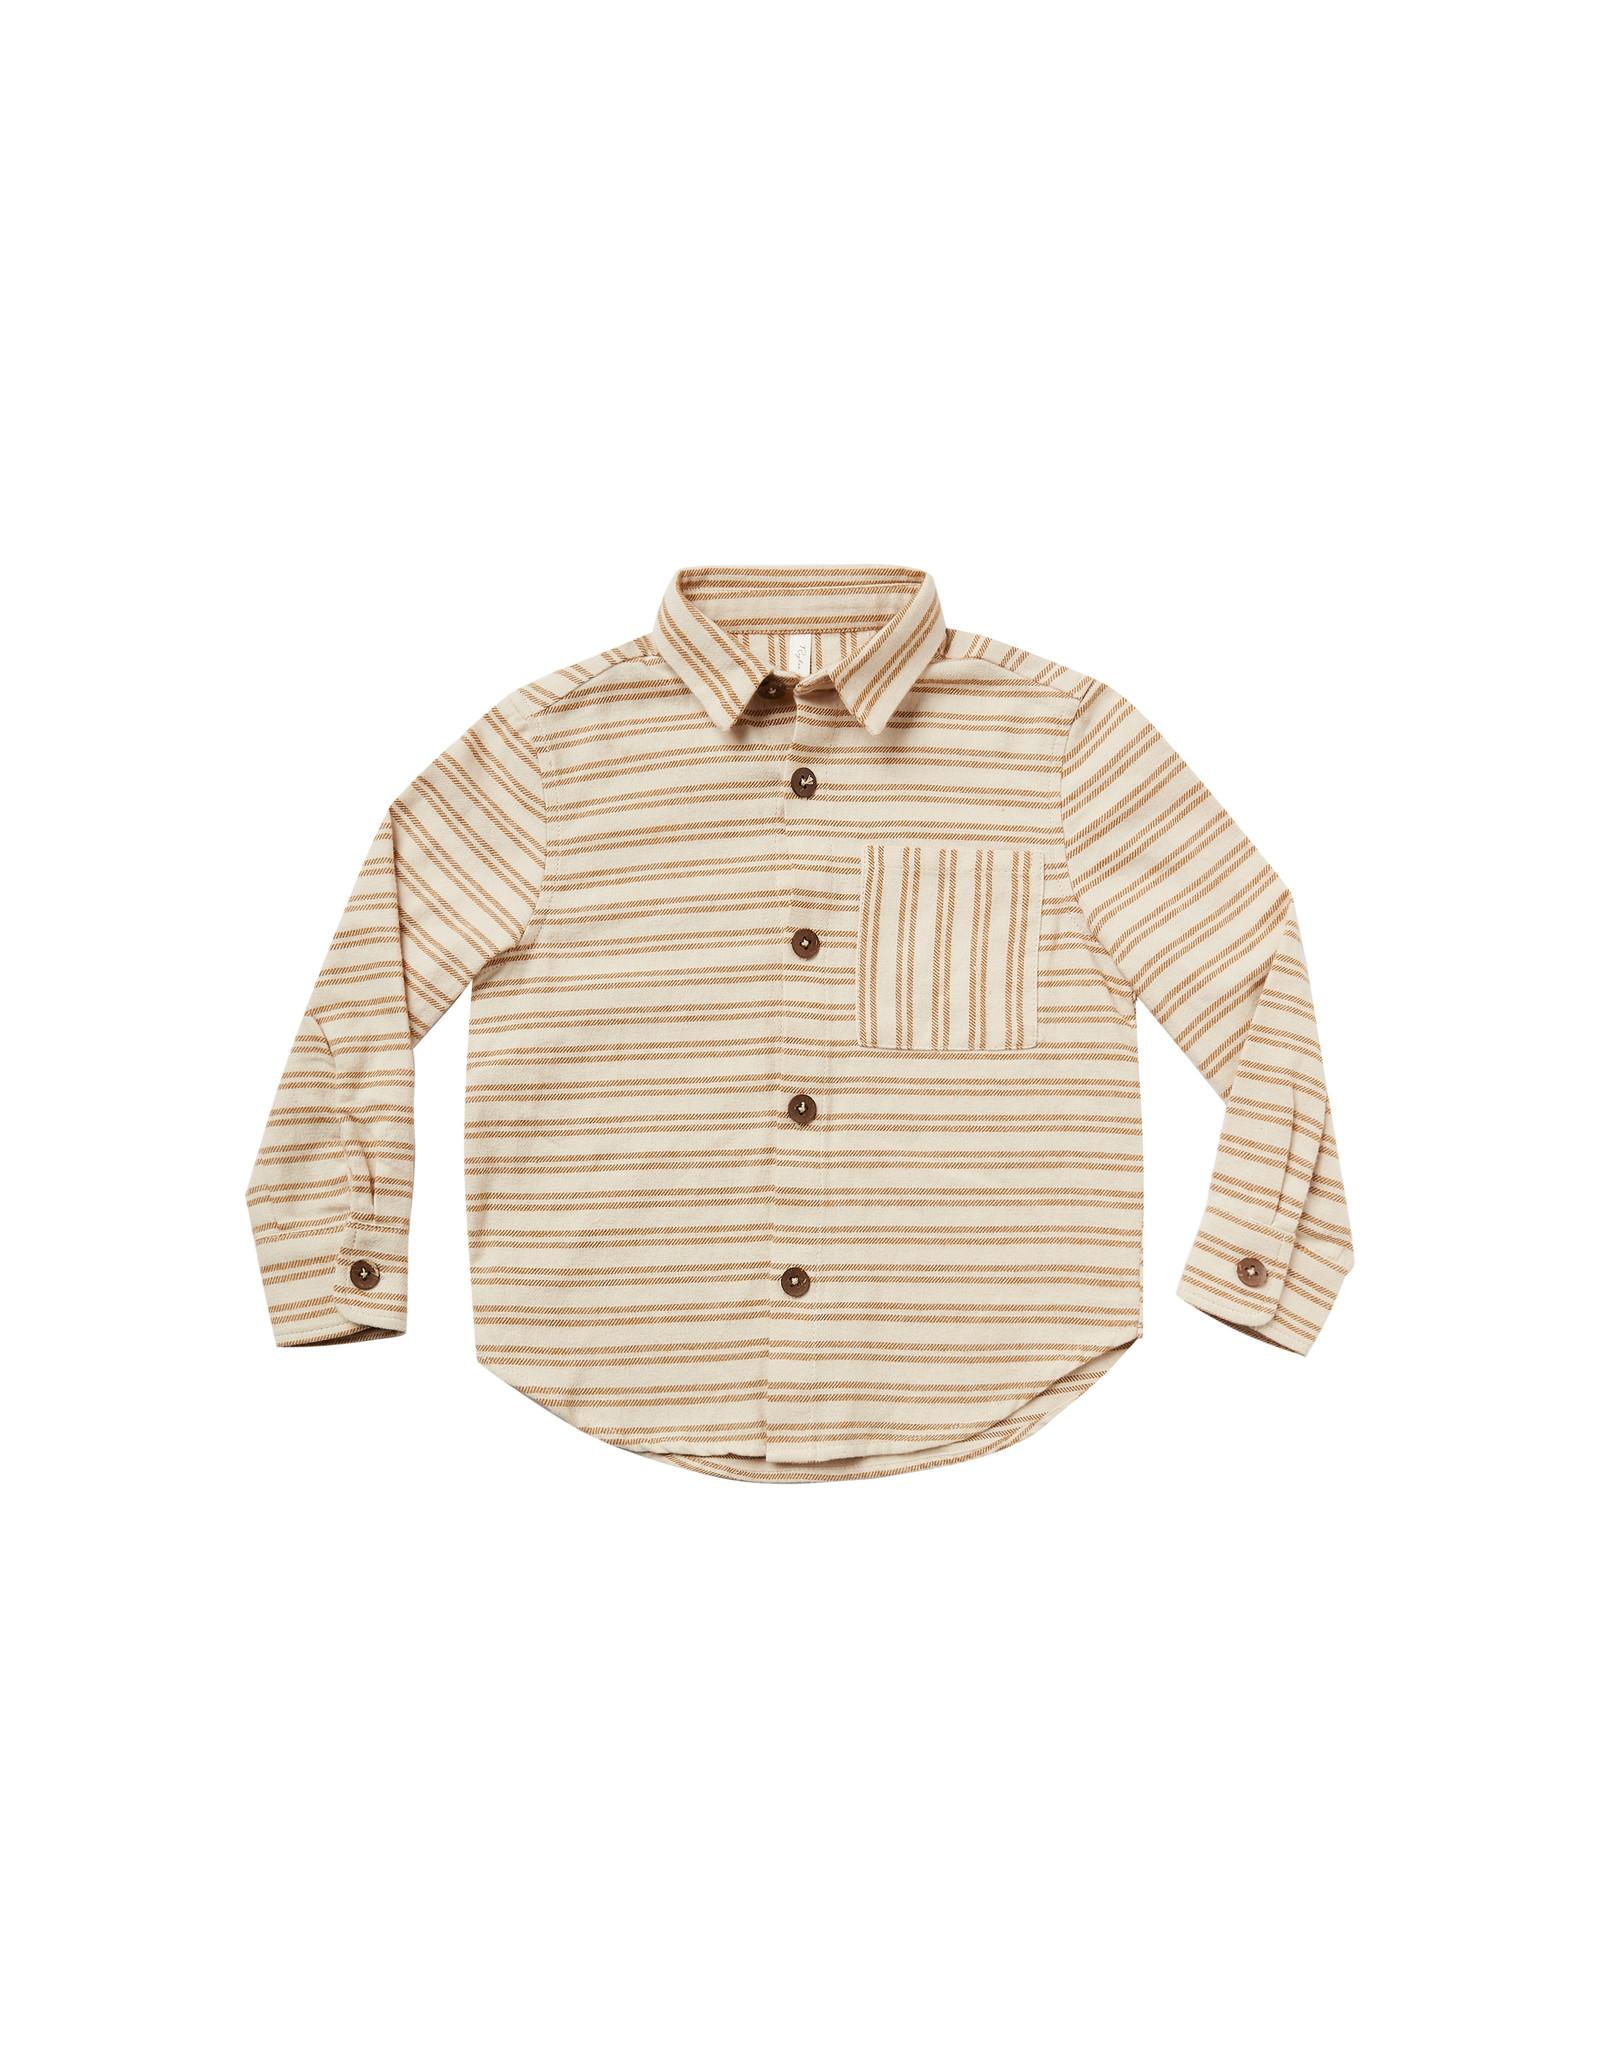 Rylee + Cru Striped Collared Shirt